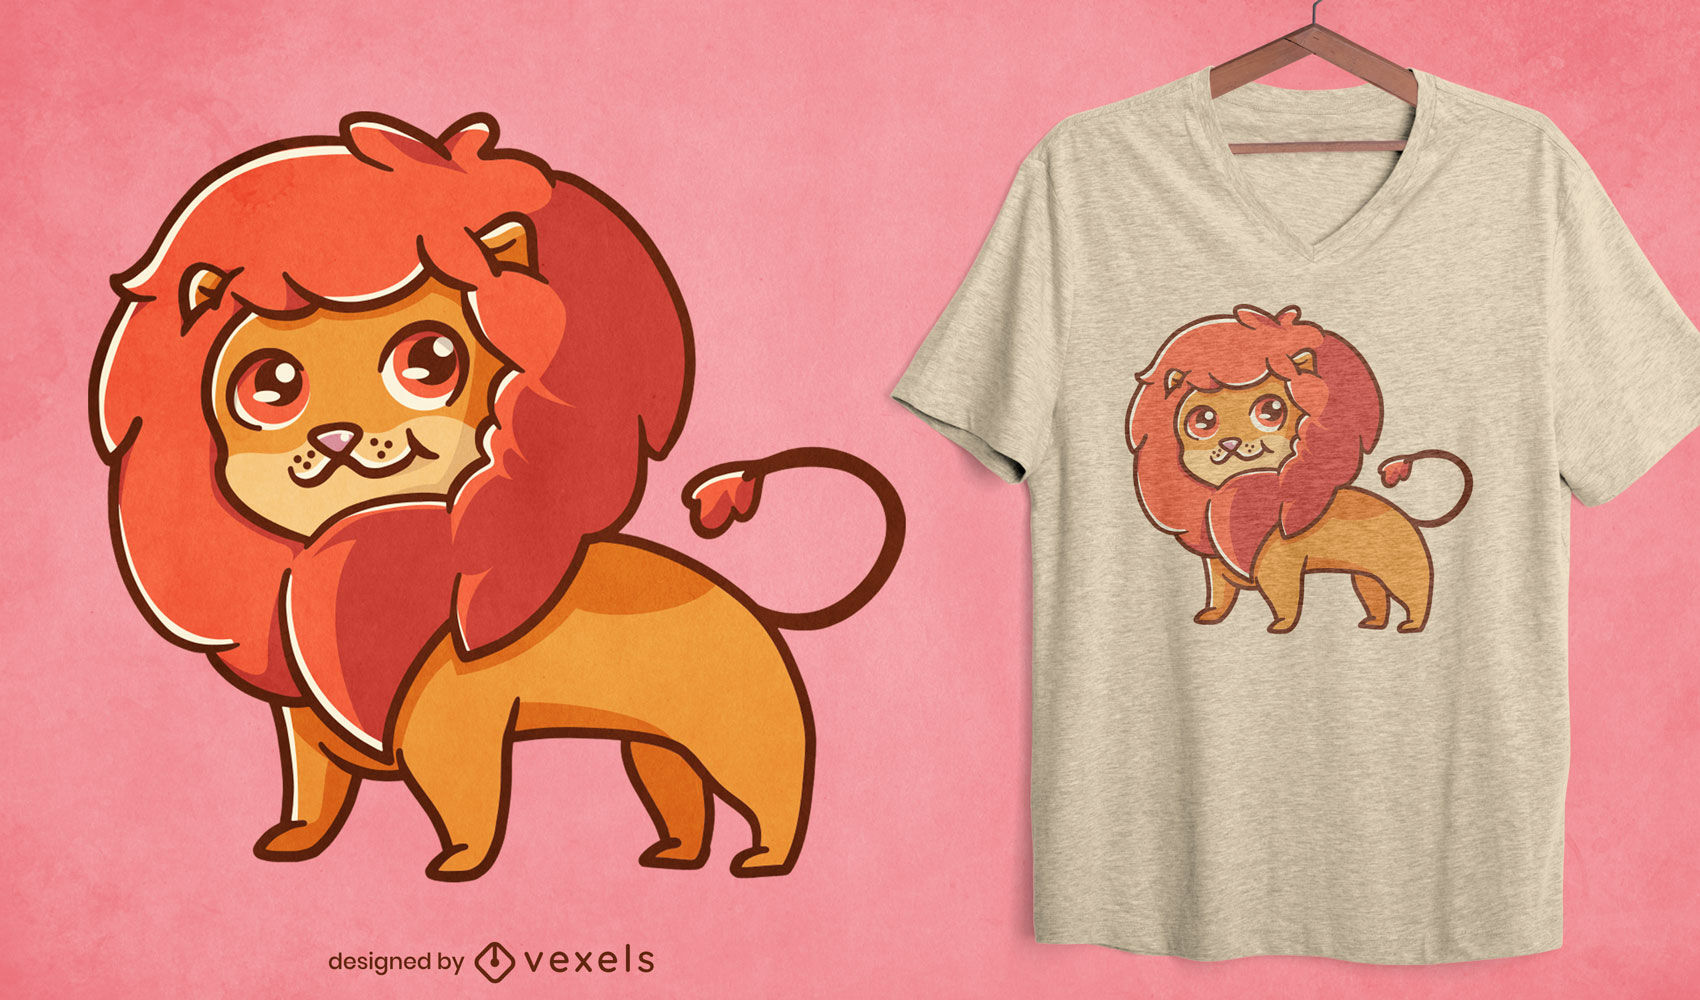 Süßes Löwen-T-Shirt-Design